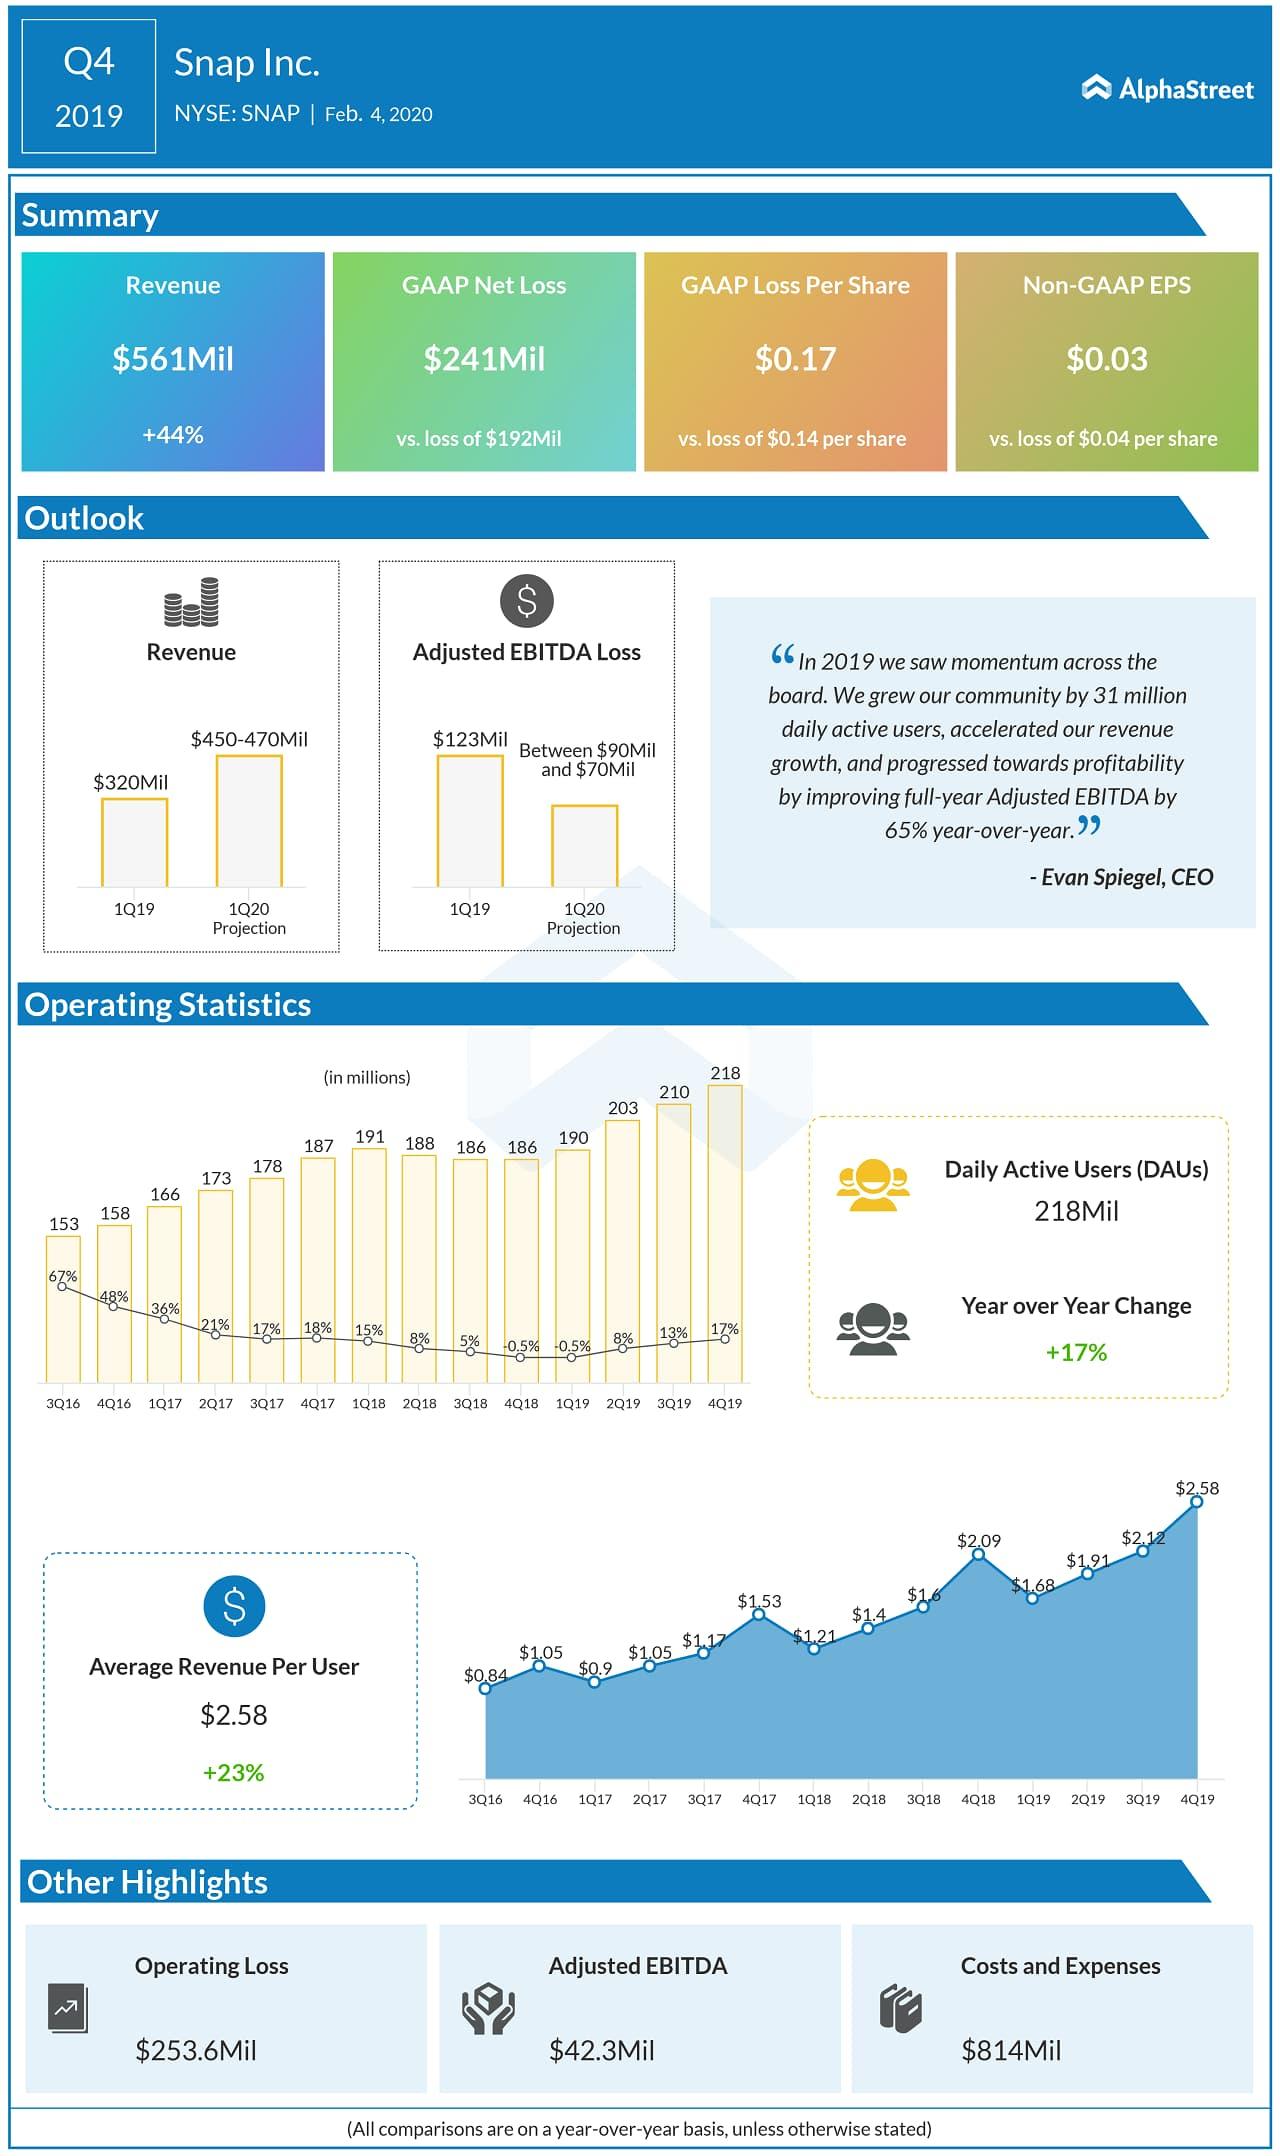 Snap Inc (SNAP) Q4 2019 earnings infograph